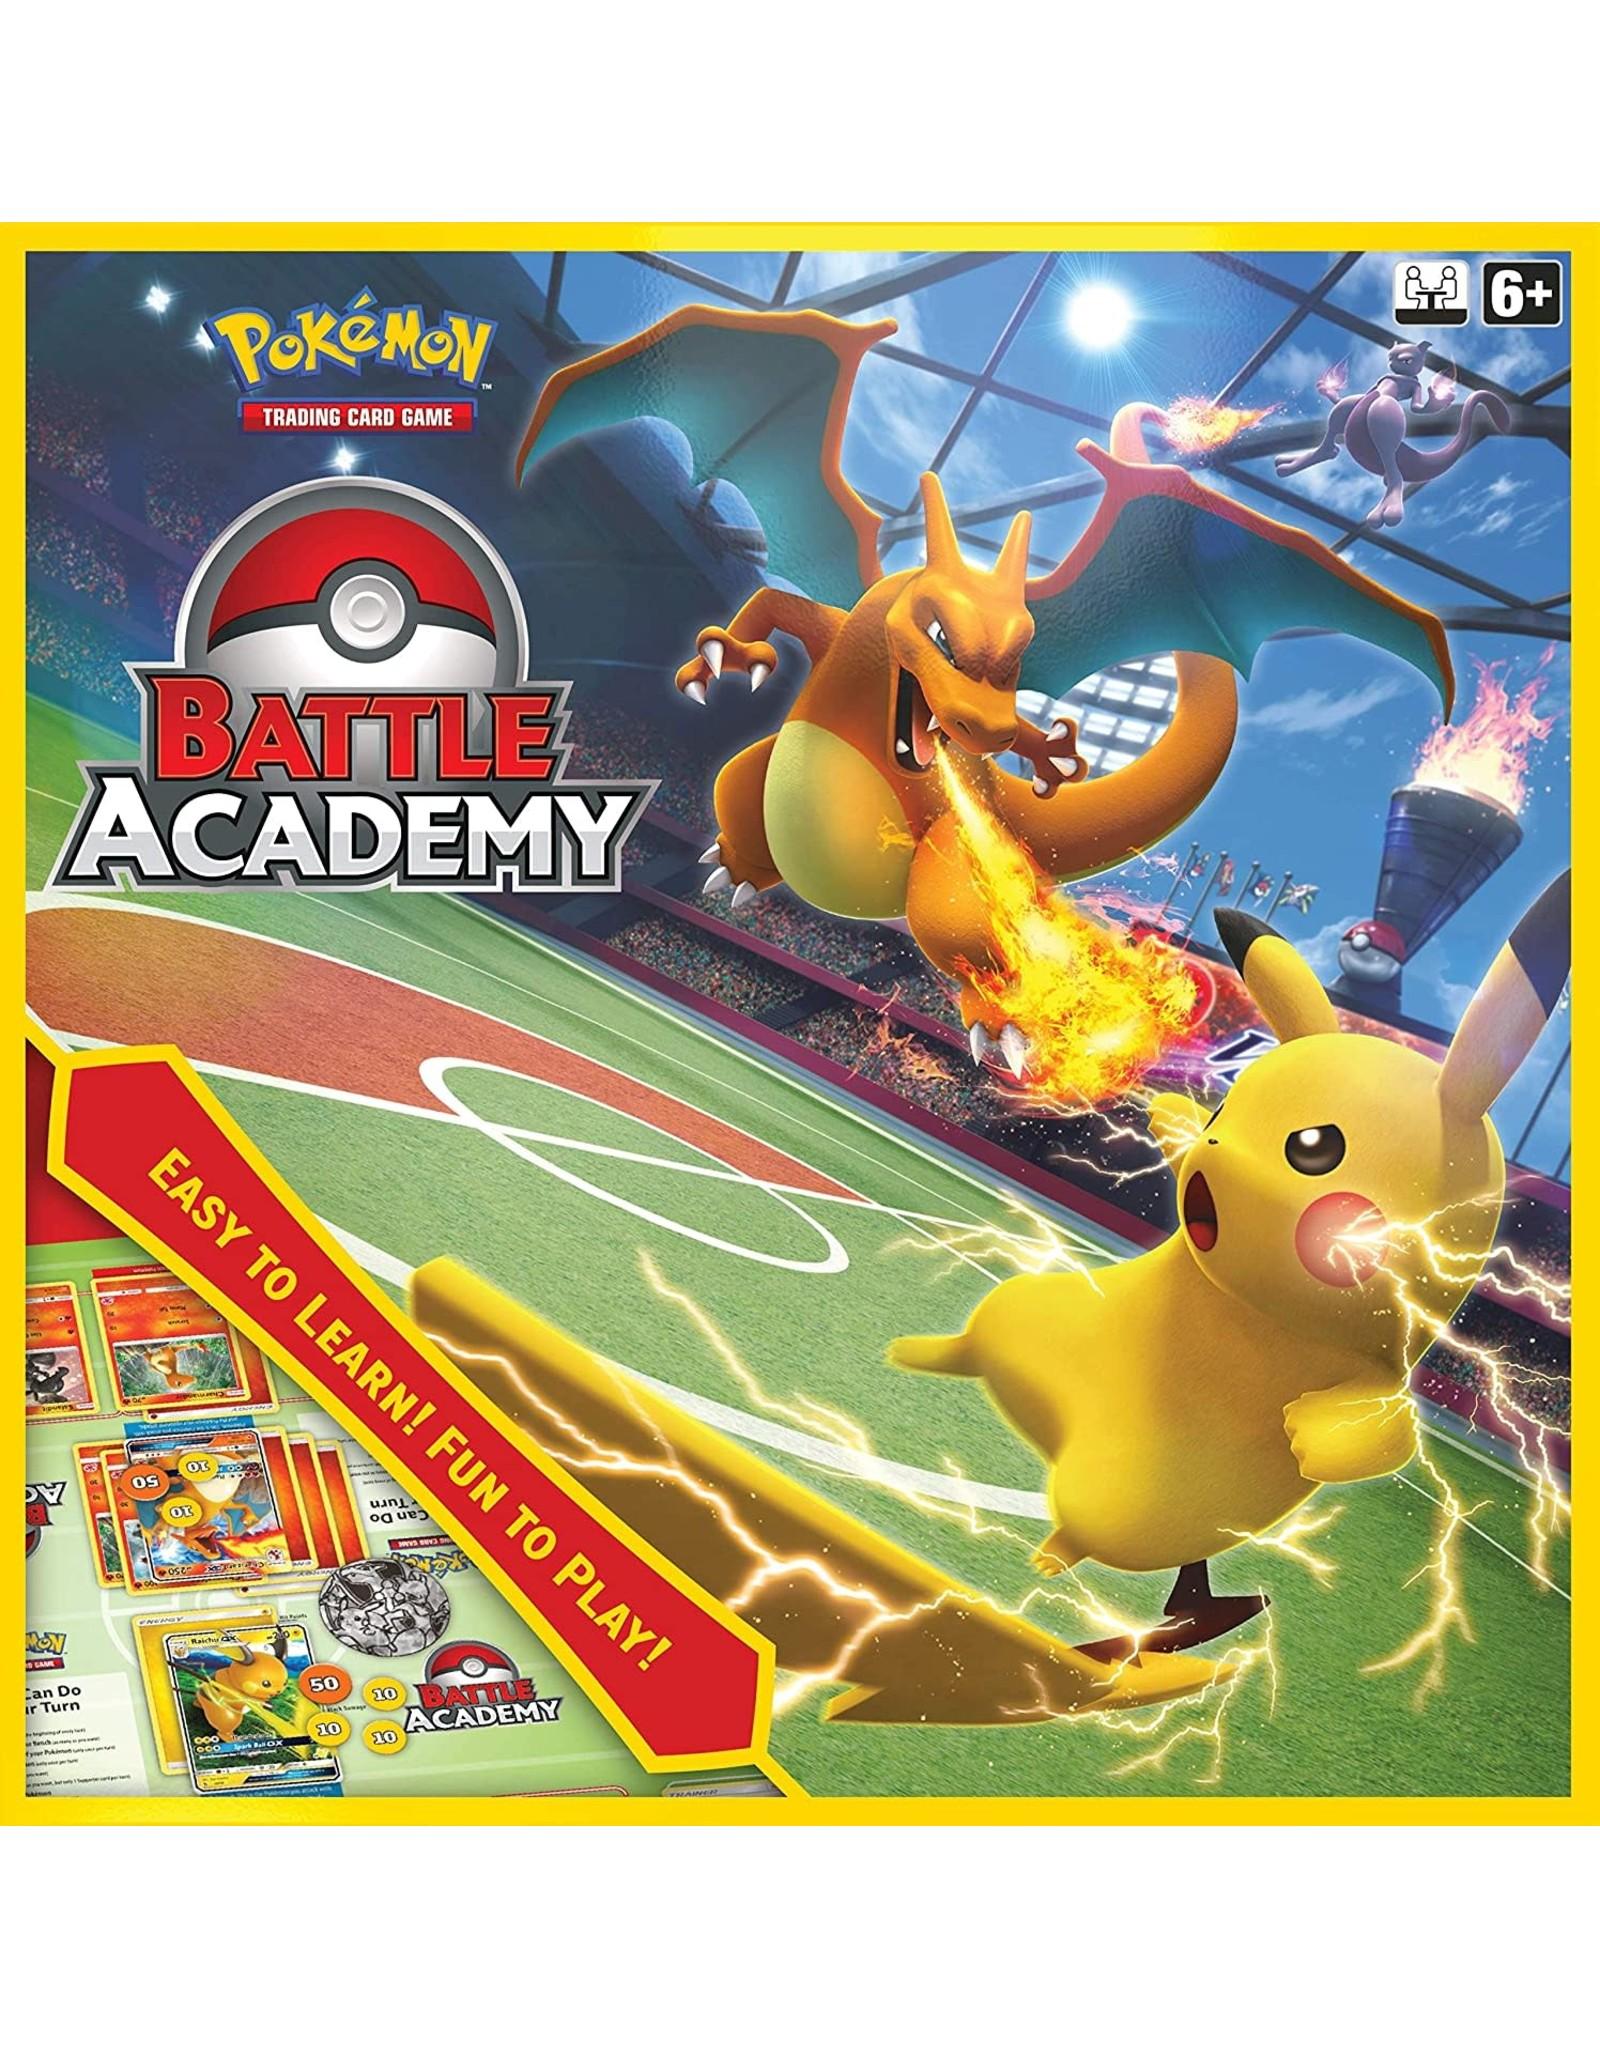 Pokemon Company Pokémon: Battle Academy